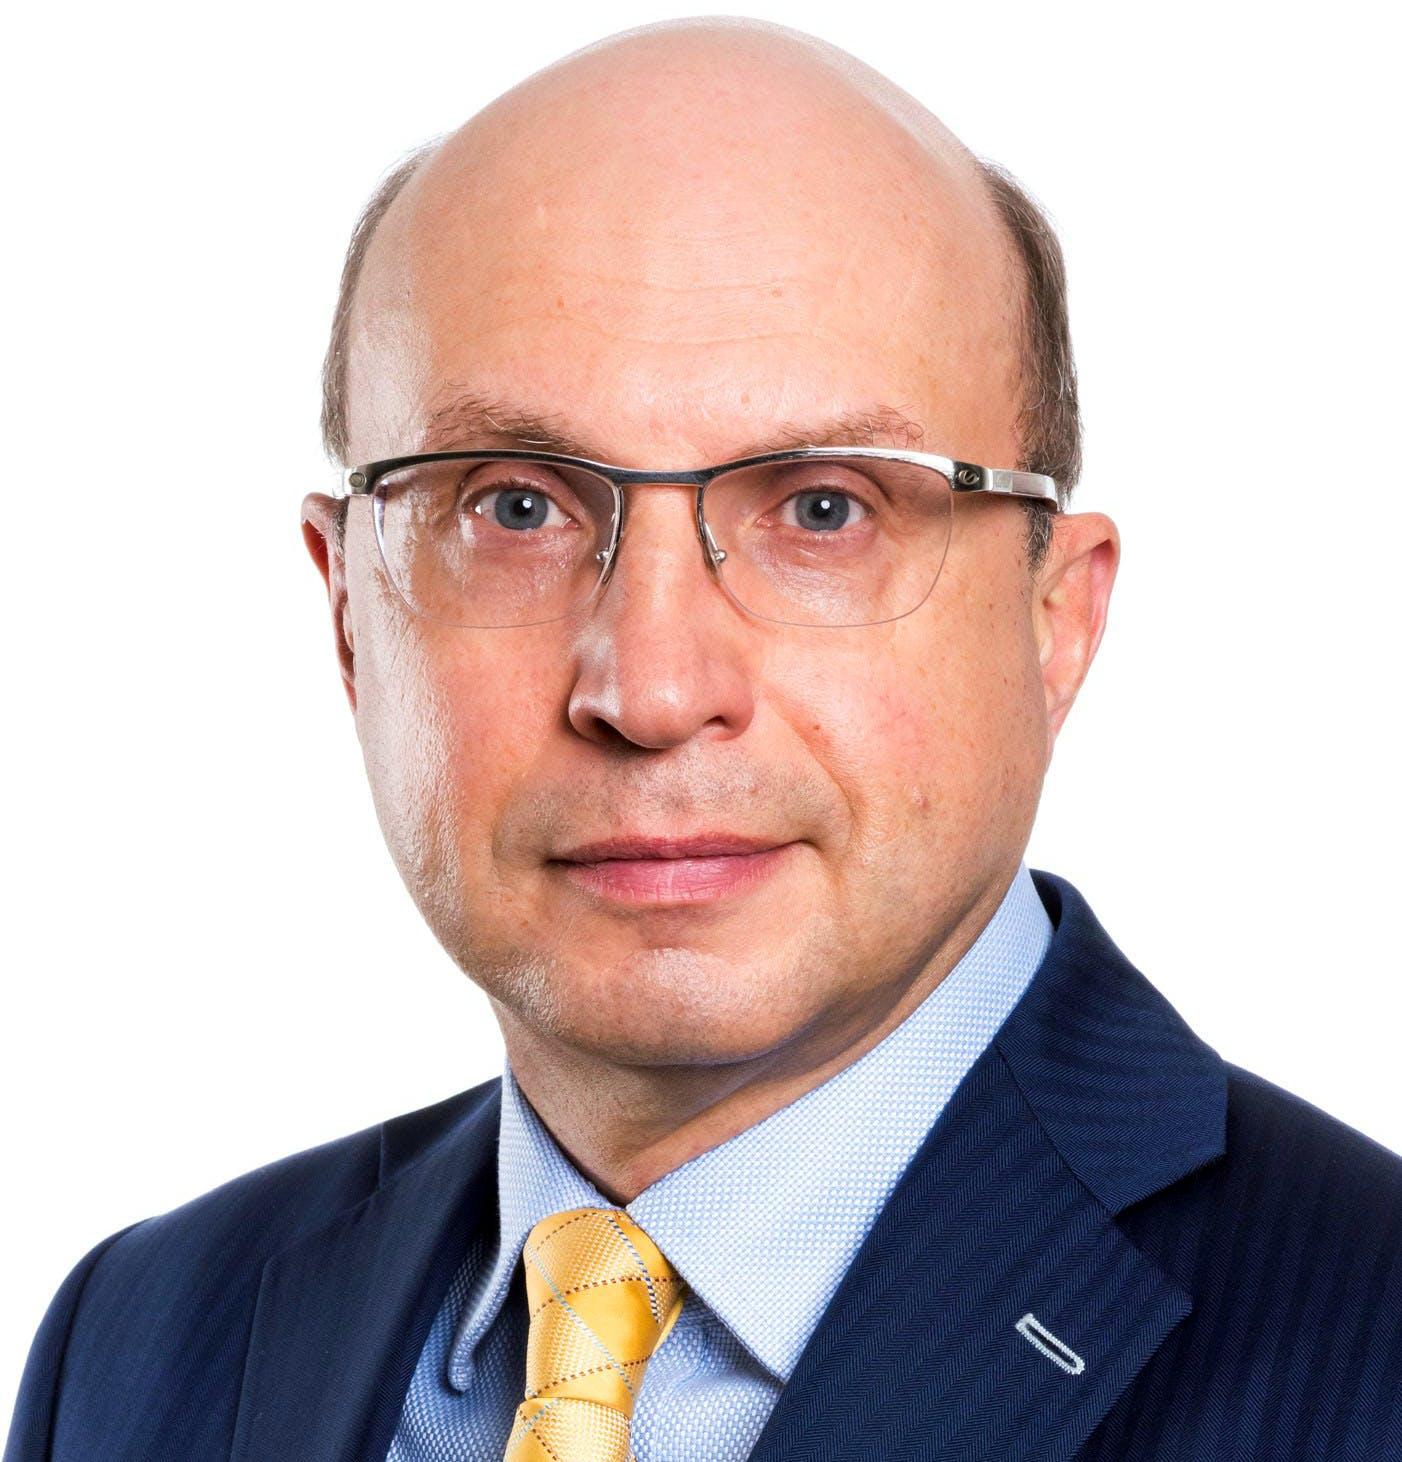 Andrei Baev ReedSmith